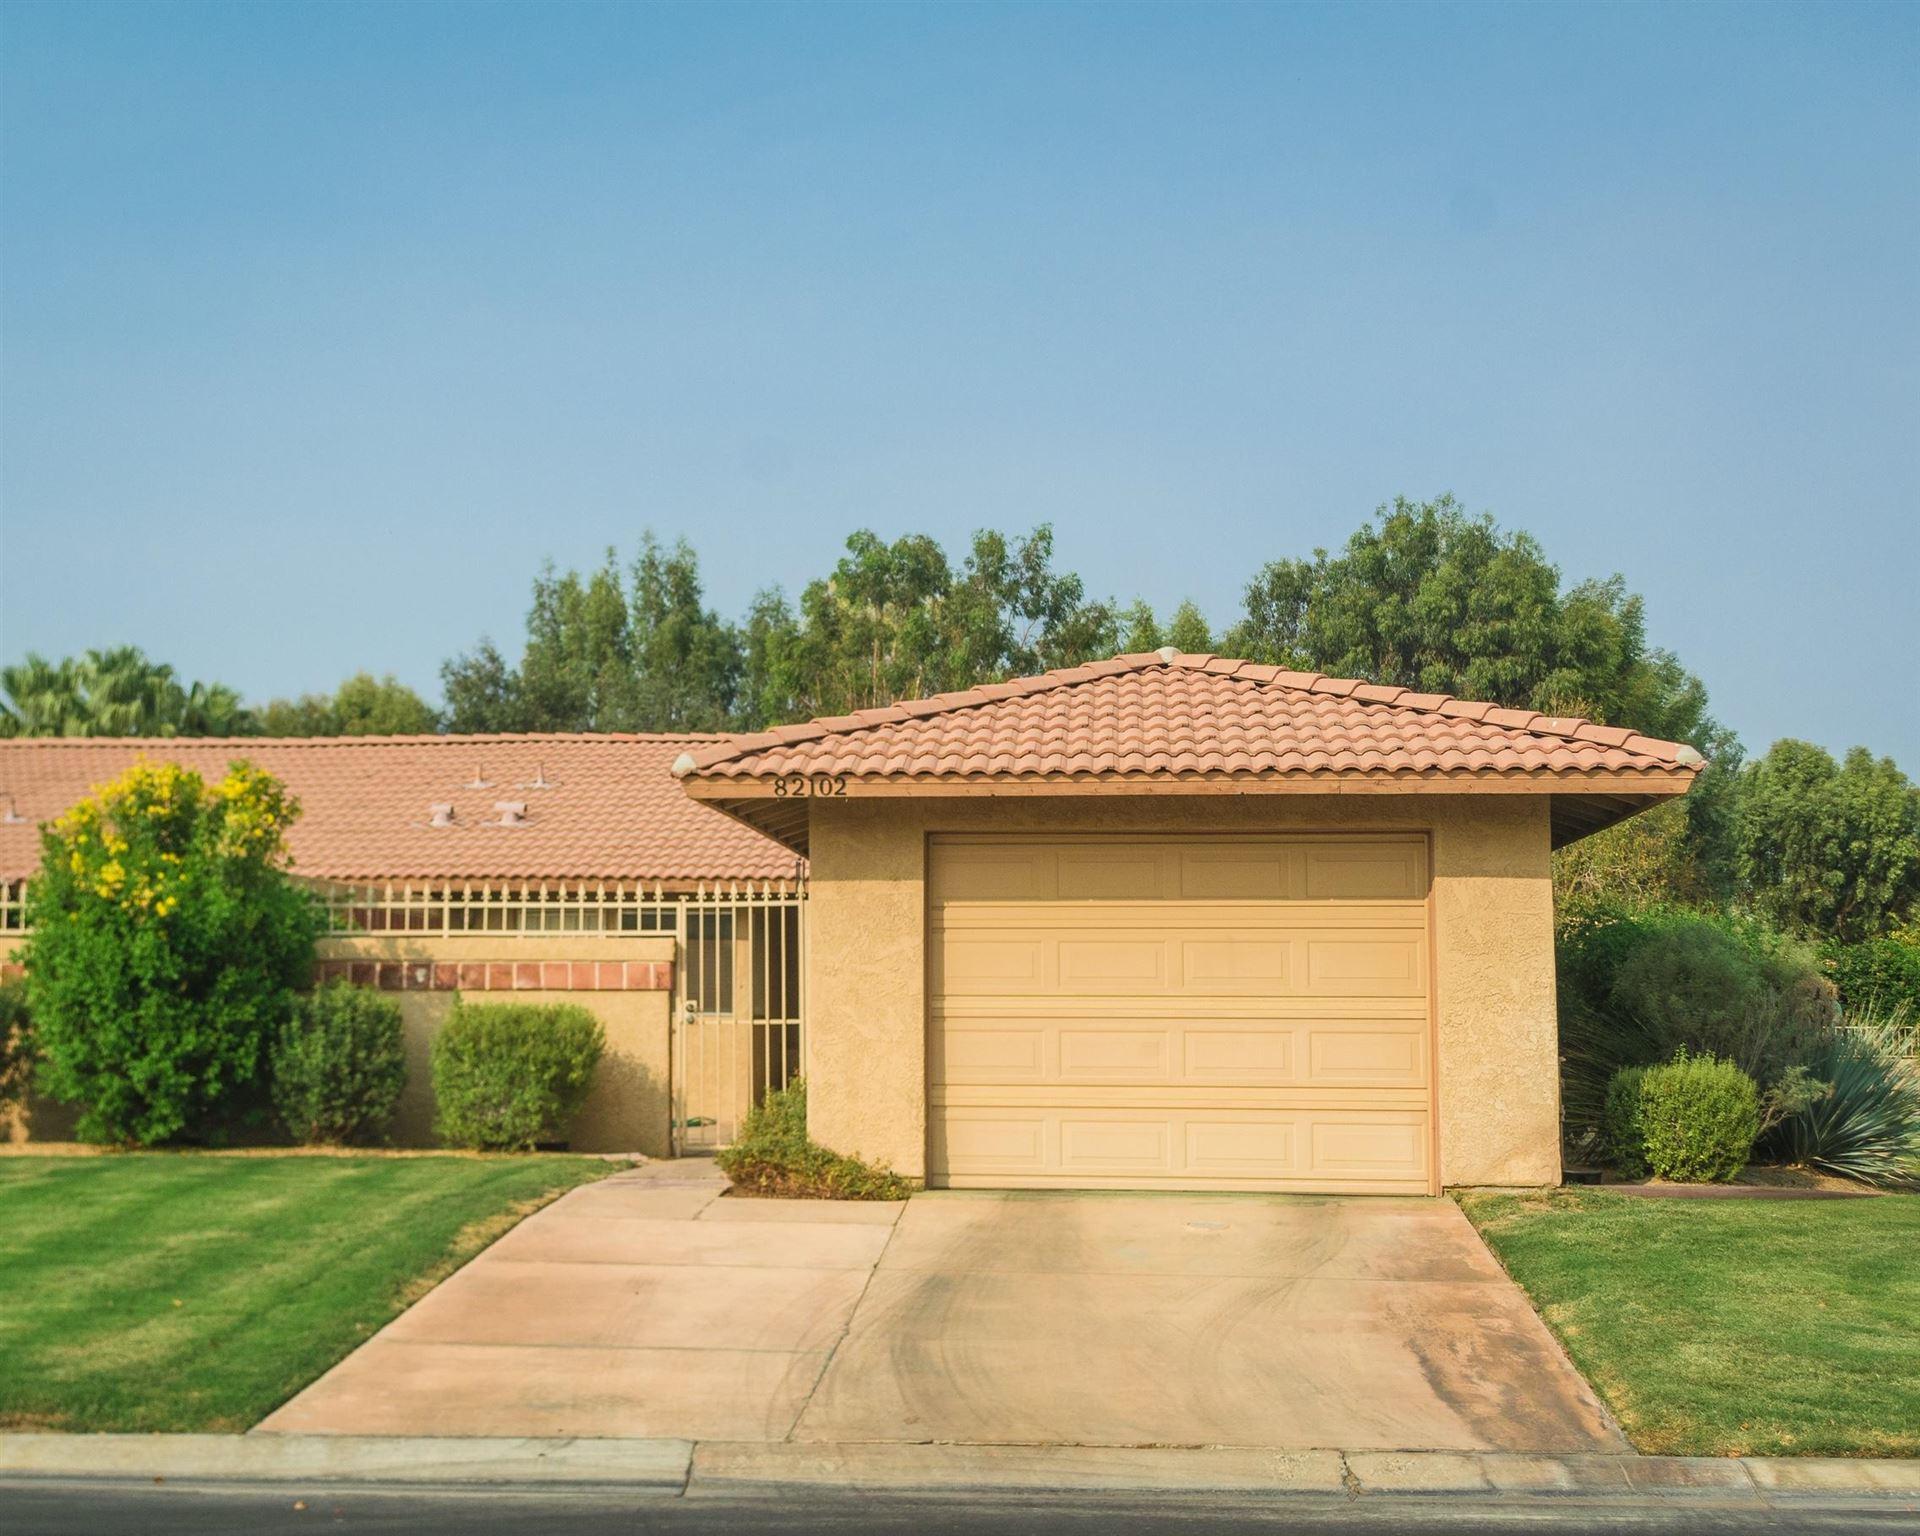 82102 Cochran Drive, Indio, CA 92201 - MLS#: 219049735